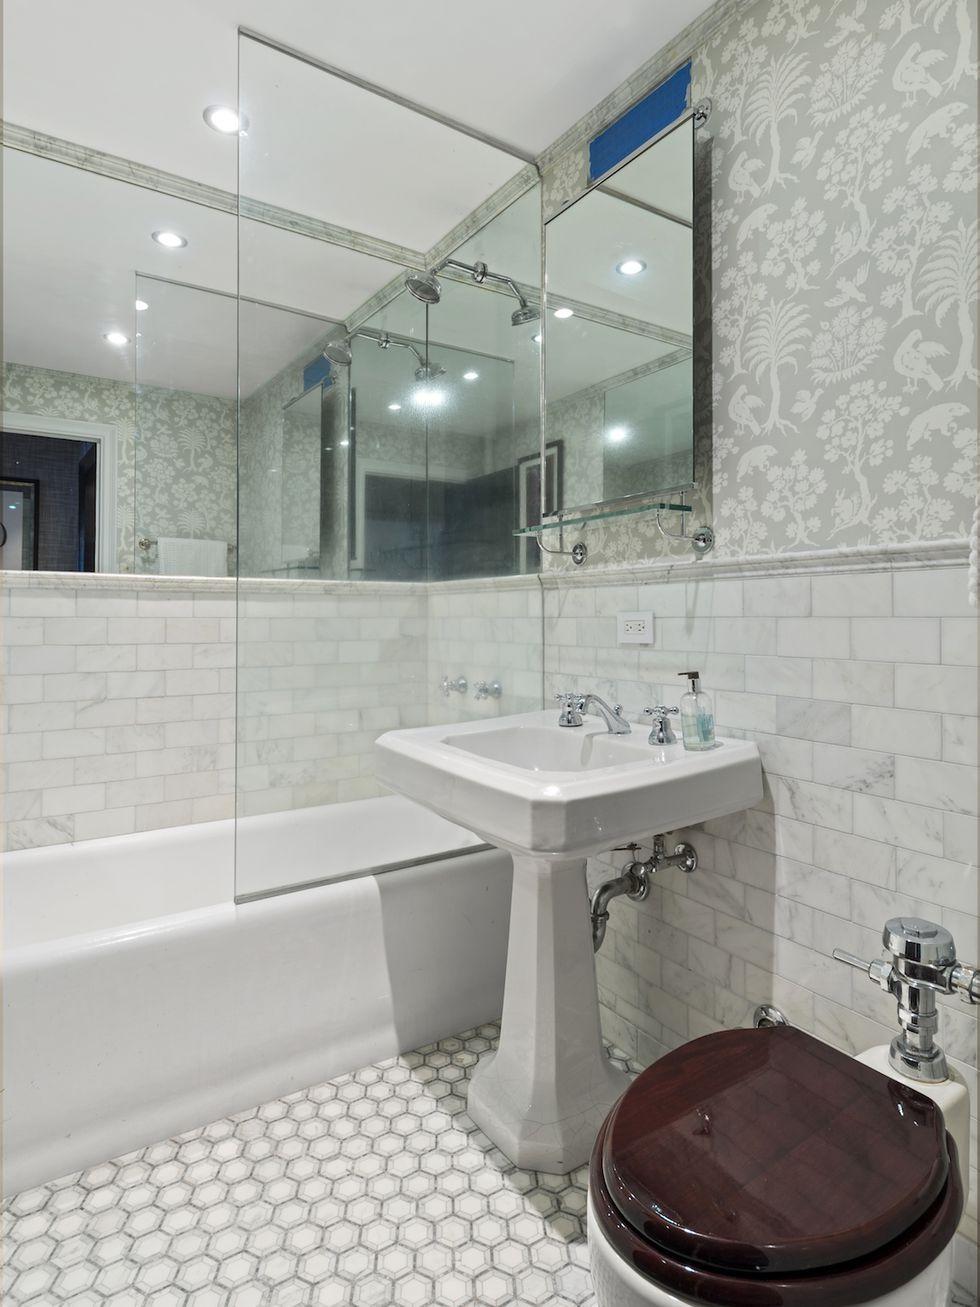 The Most Beautiful Designer Bathrooms We Ve Ever Seen In 2020 Best Bathroom Designs Modern Bathroom Design Latest Bathroom Designs